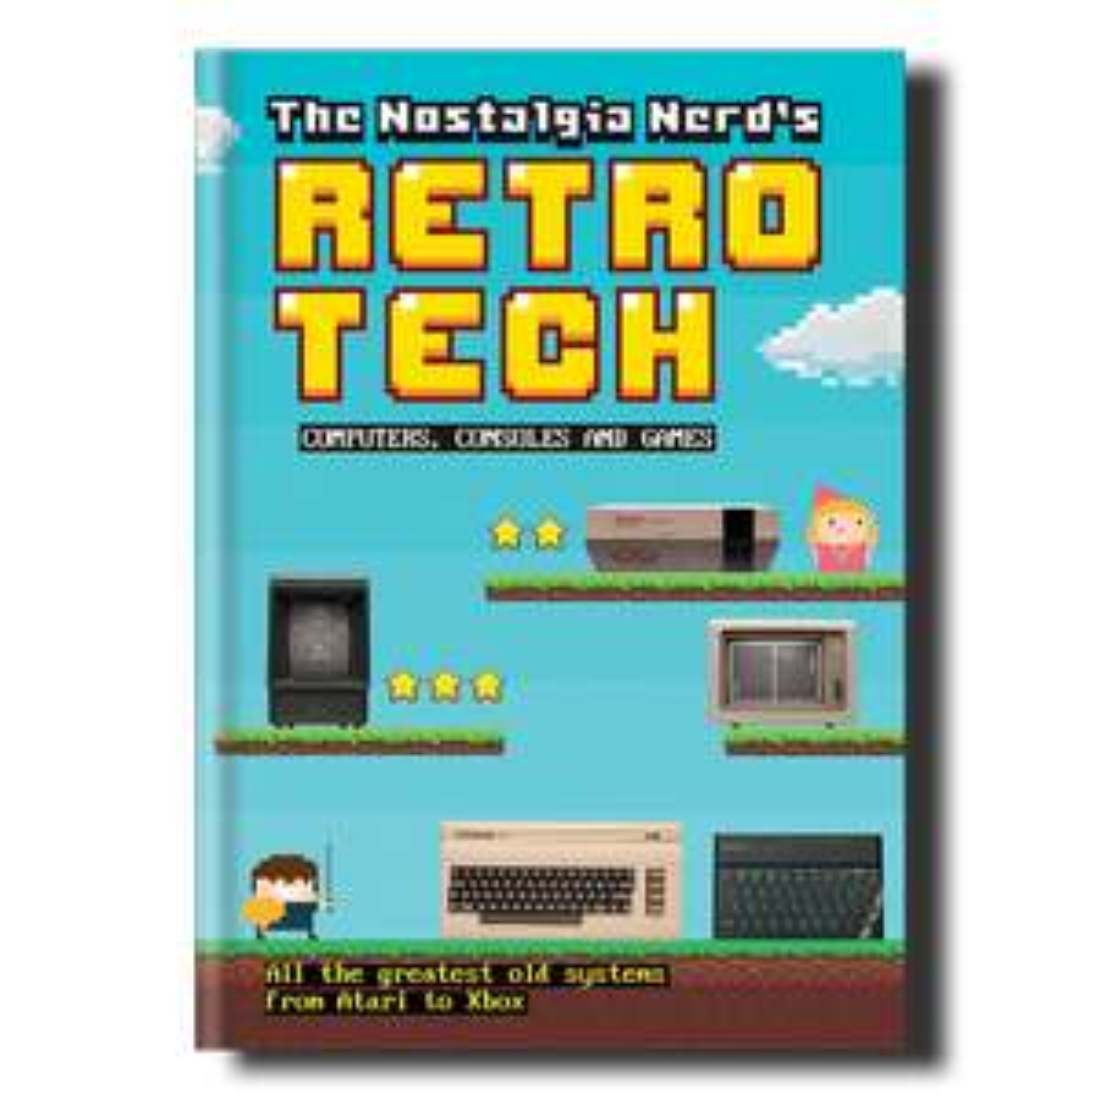 Nostalgia Nerd's Retro Tech, Computing & Gaming Book [Hardcover]  £4 (Prime) / £6.99 (non Prime) at Amazon